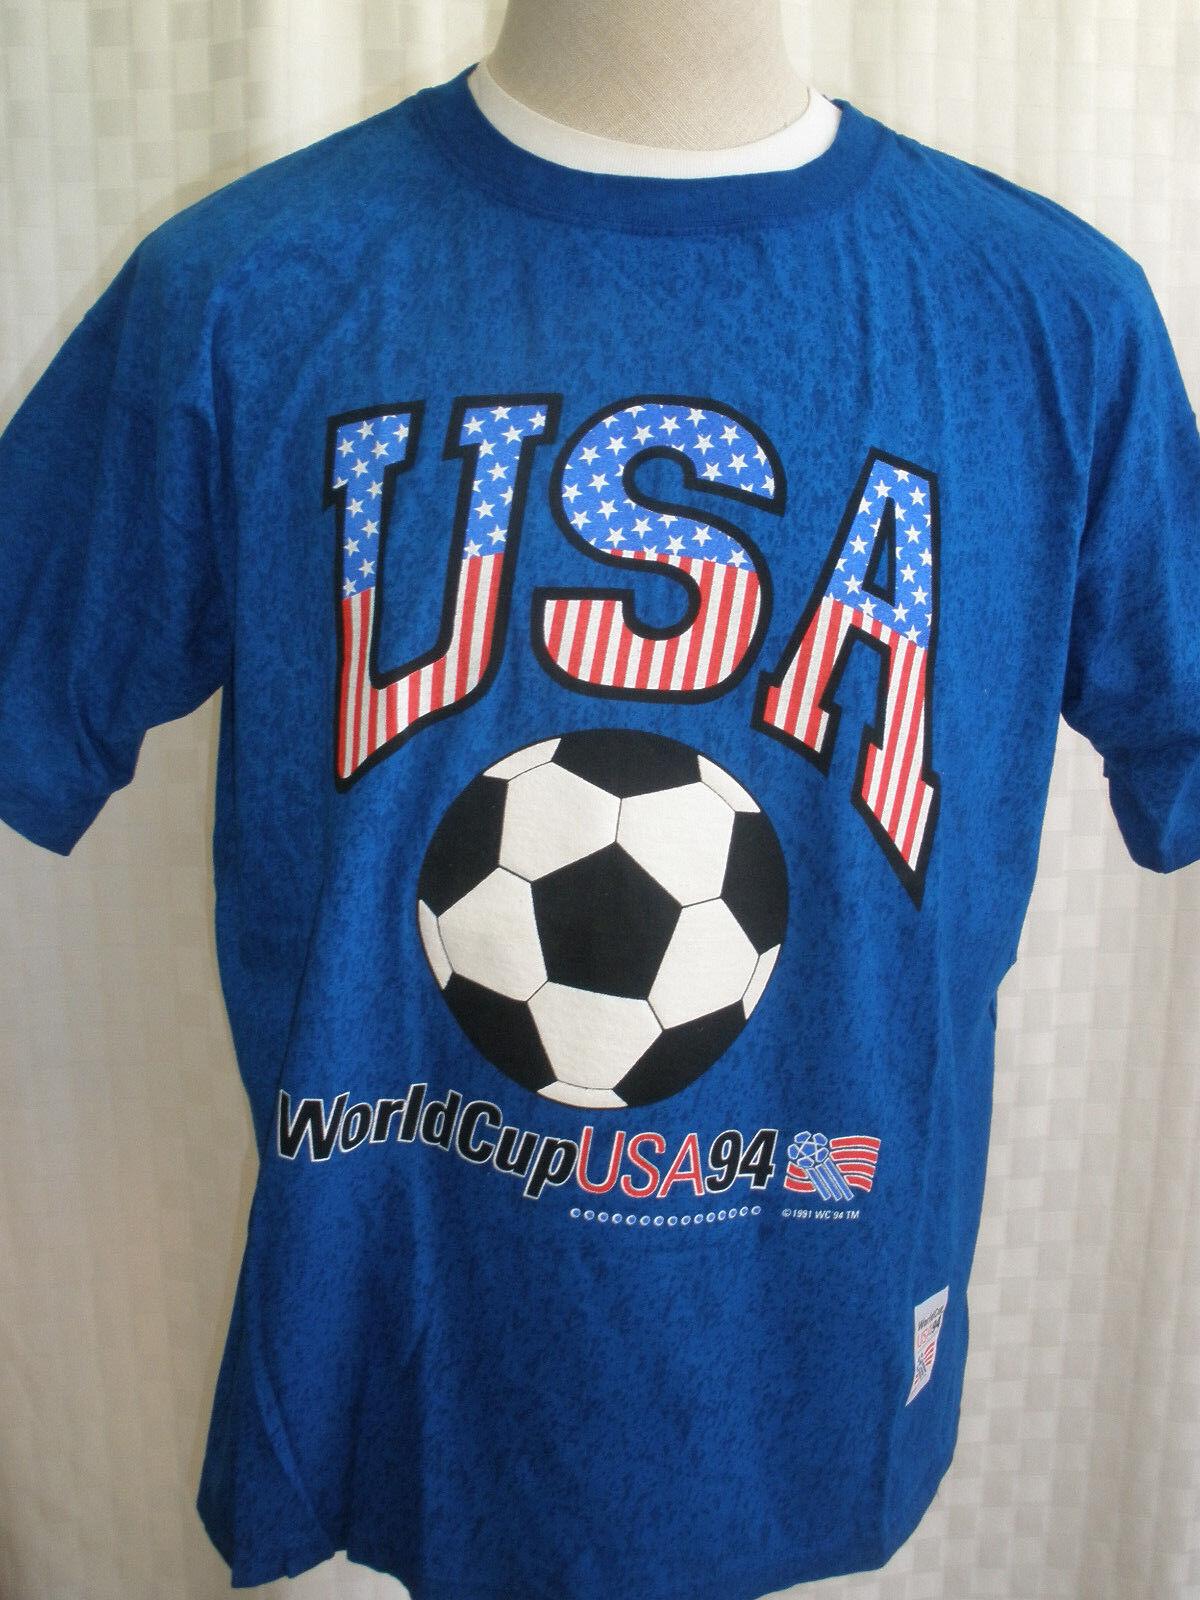 WORLD CUP USA 94' FOOTBALL T-SHIRT SIZE  XXL VINTAGE NWT RARE